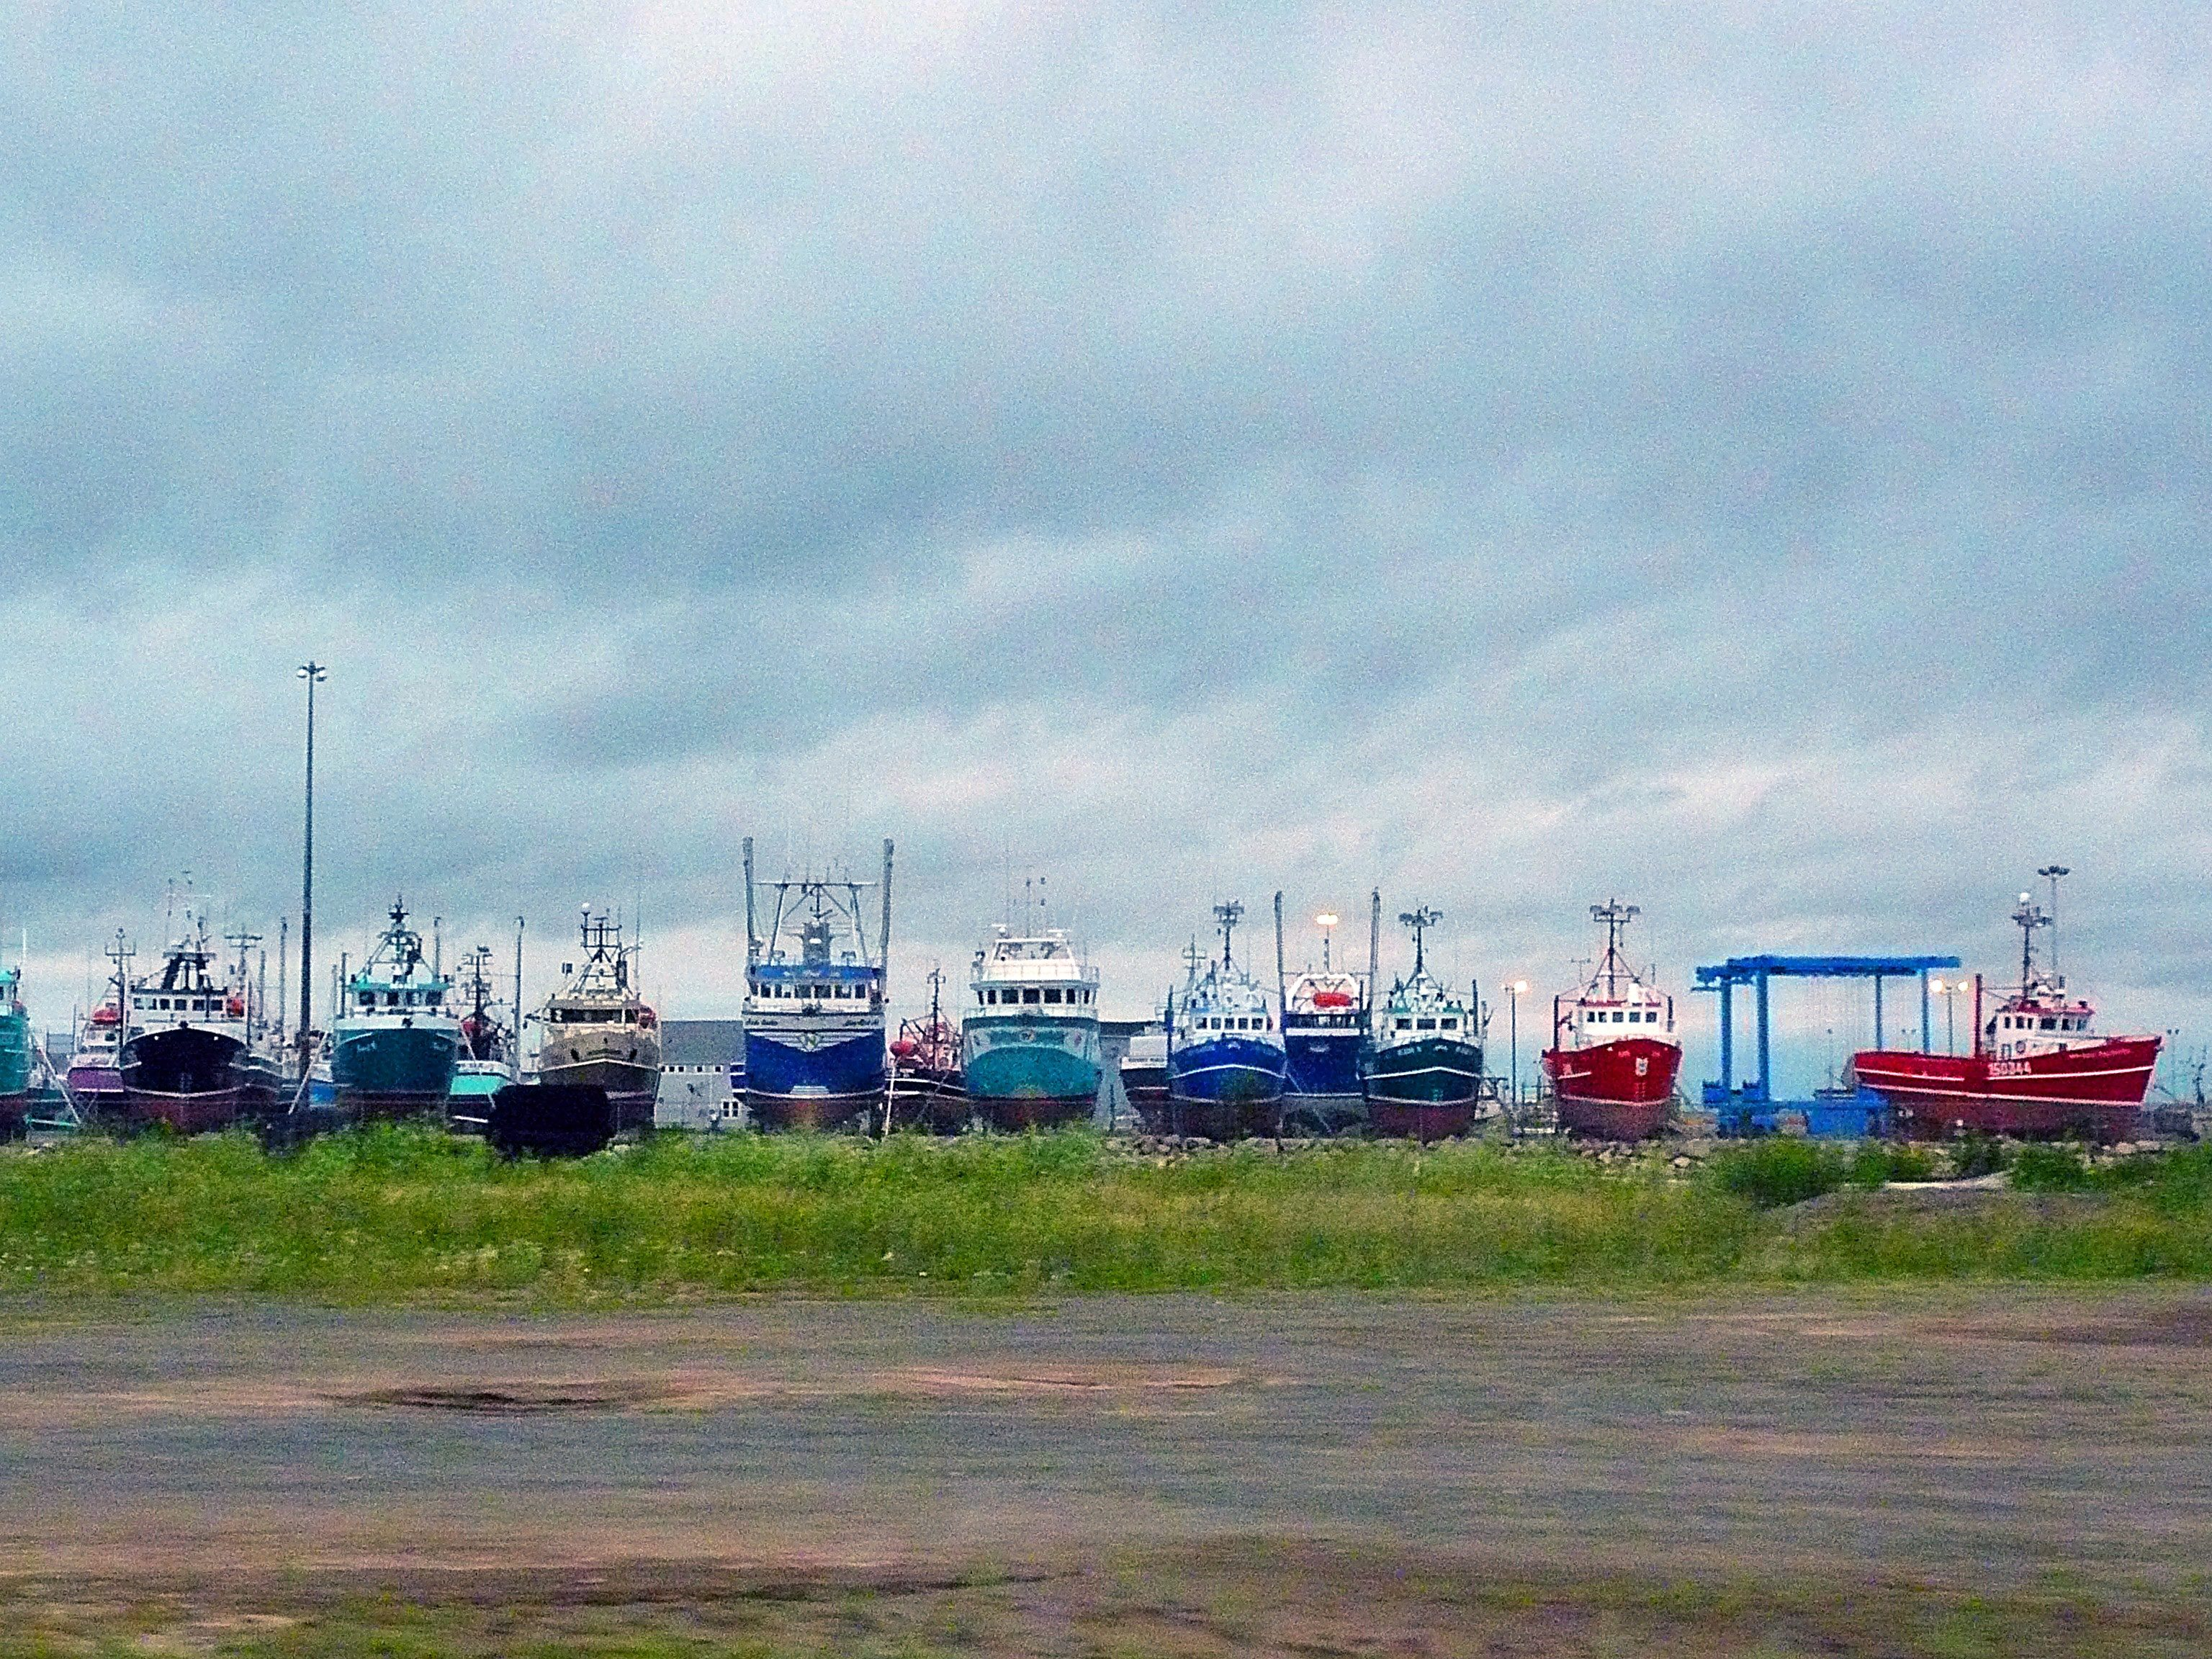 4. Fishing Boats